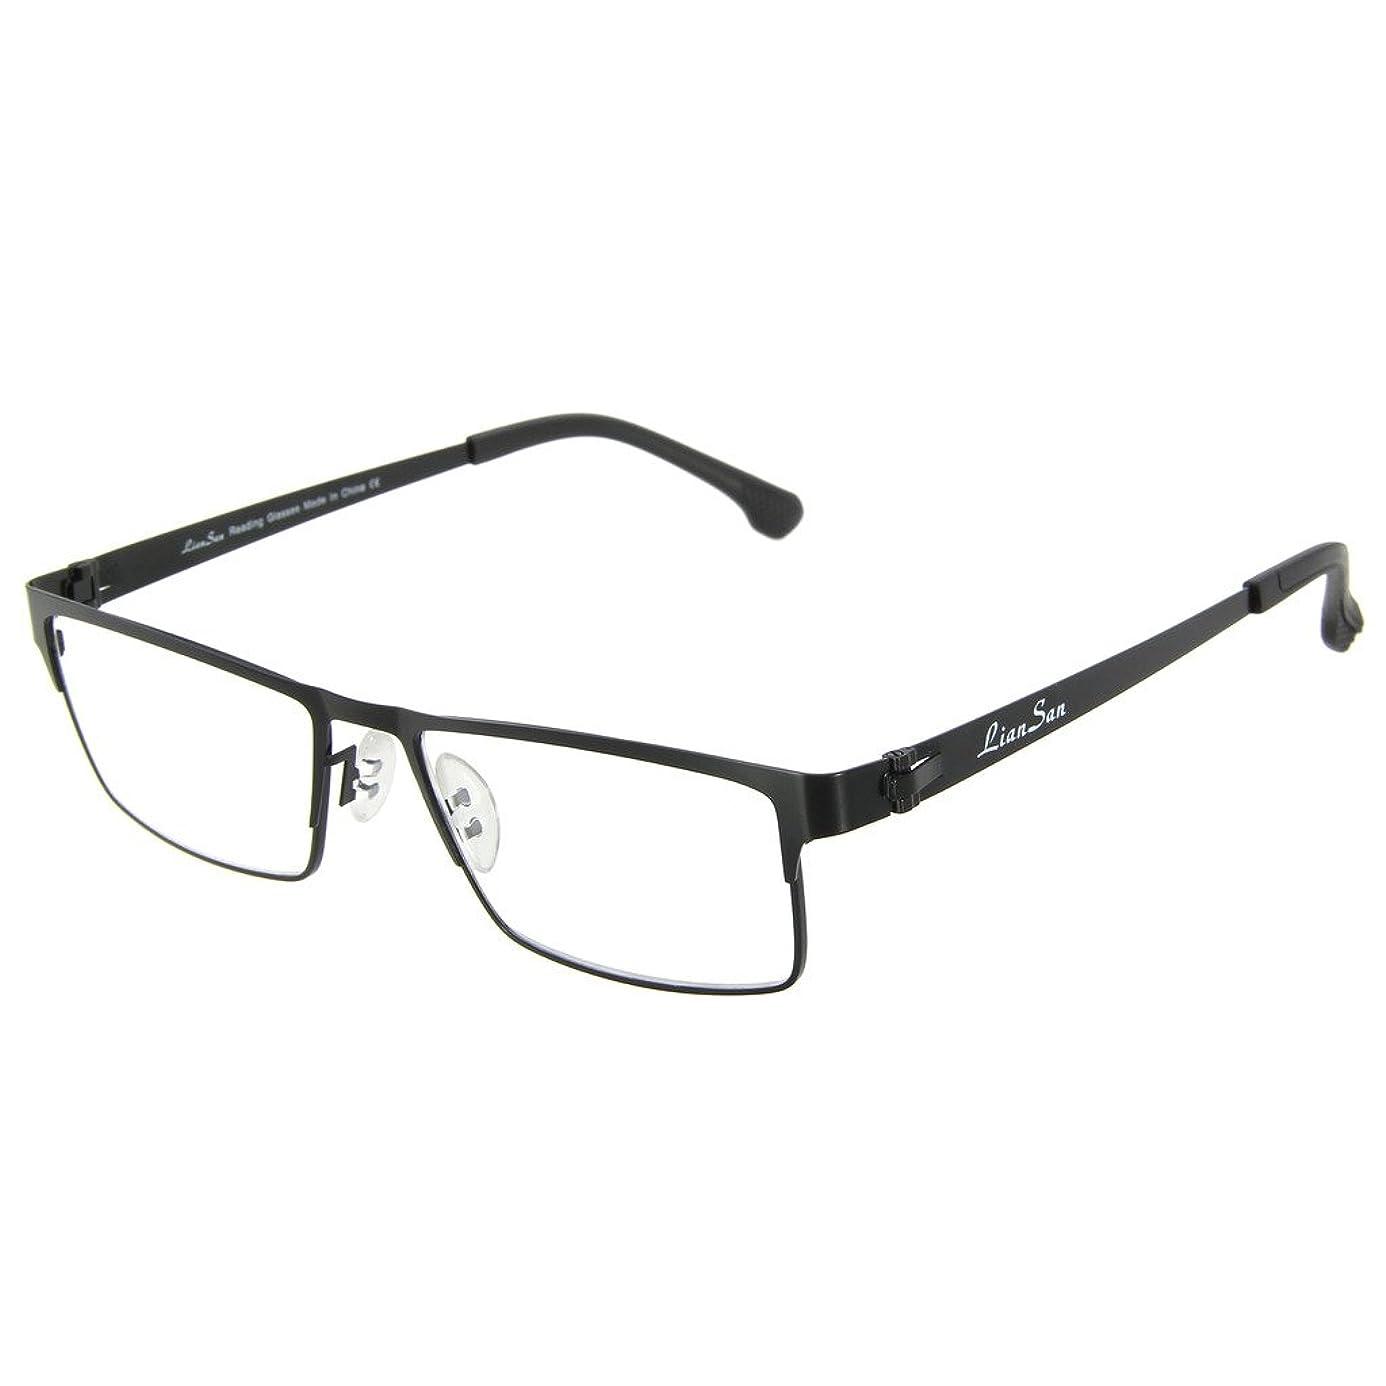 LianSan Computer Video Gaming Reading Glasses in Stainless Steel Metal Frame Anti Harmful Glare, UV and Blue Light Lens L5610(Black,+2.75) ovw9693071